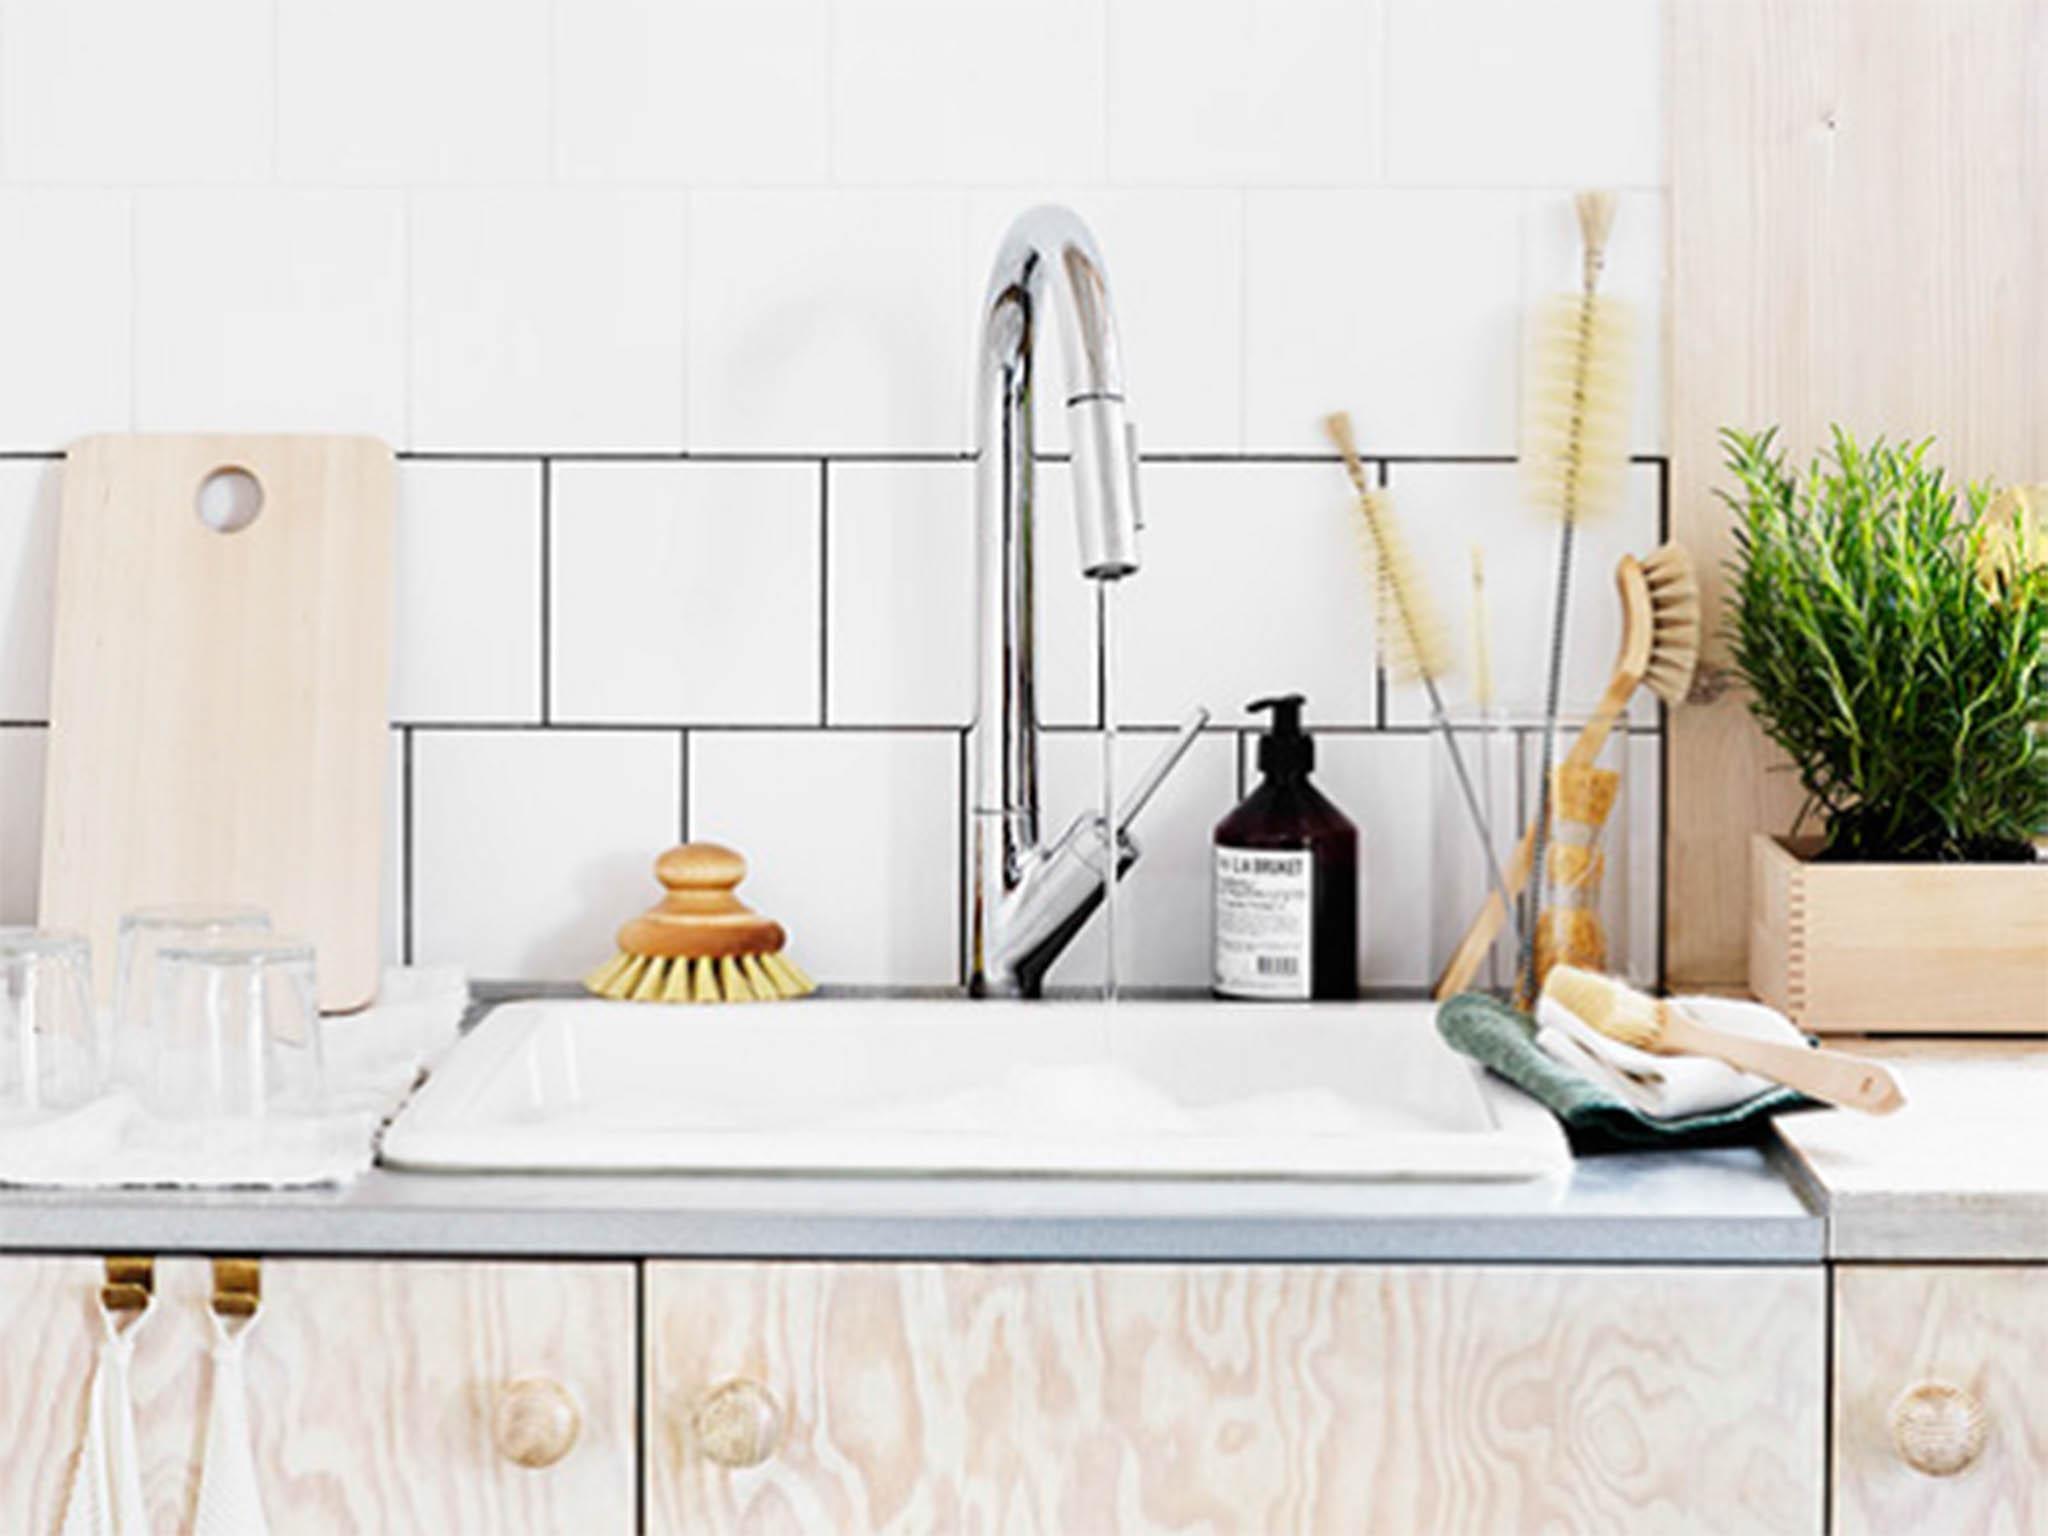 45 Pieces All Purpose Kitchen Scrubbers Scrubber Scrub Scourer Wash Clean Dish